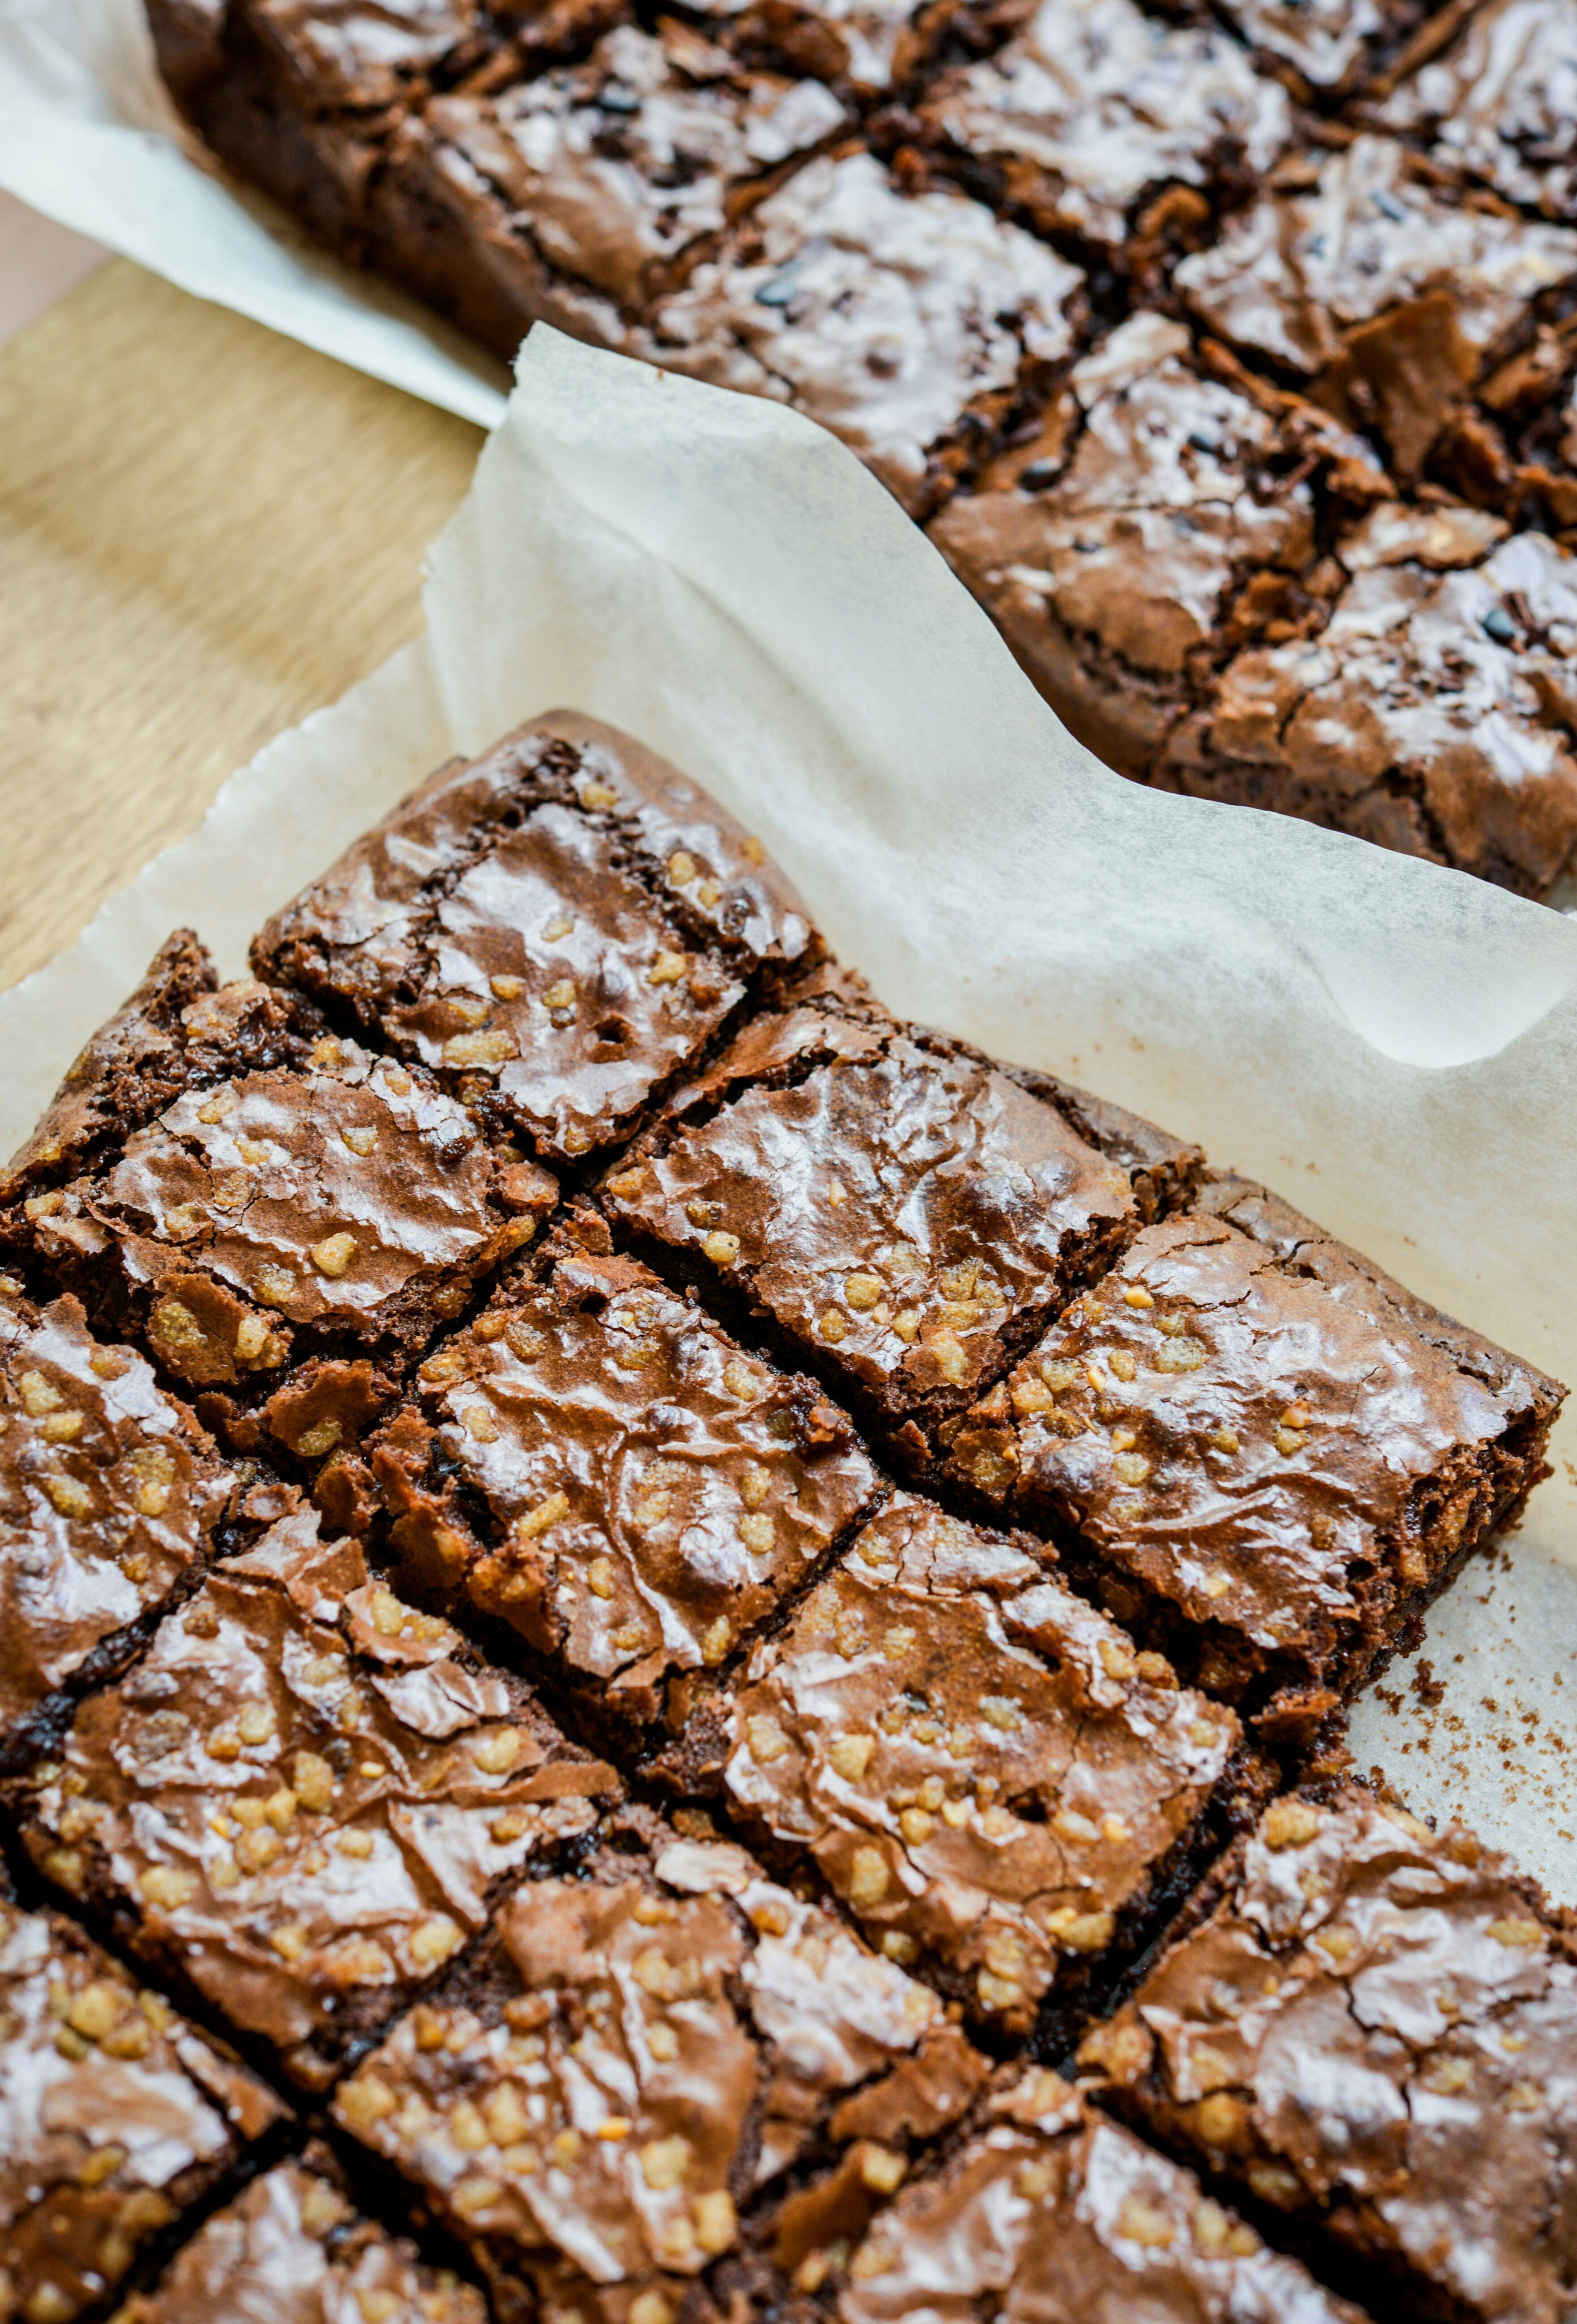 Brownies_michelle-tsang-1rqk6xvnw44-unsplash